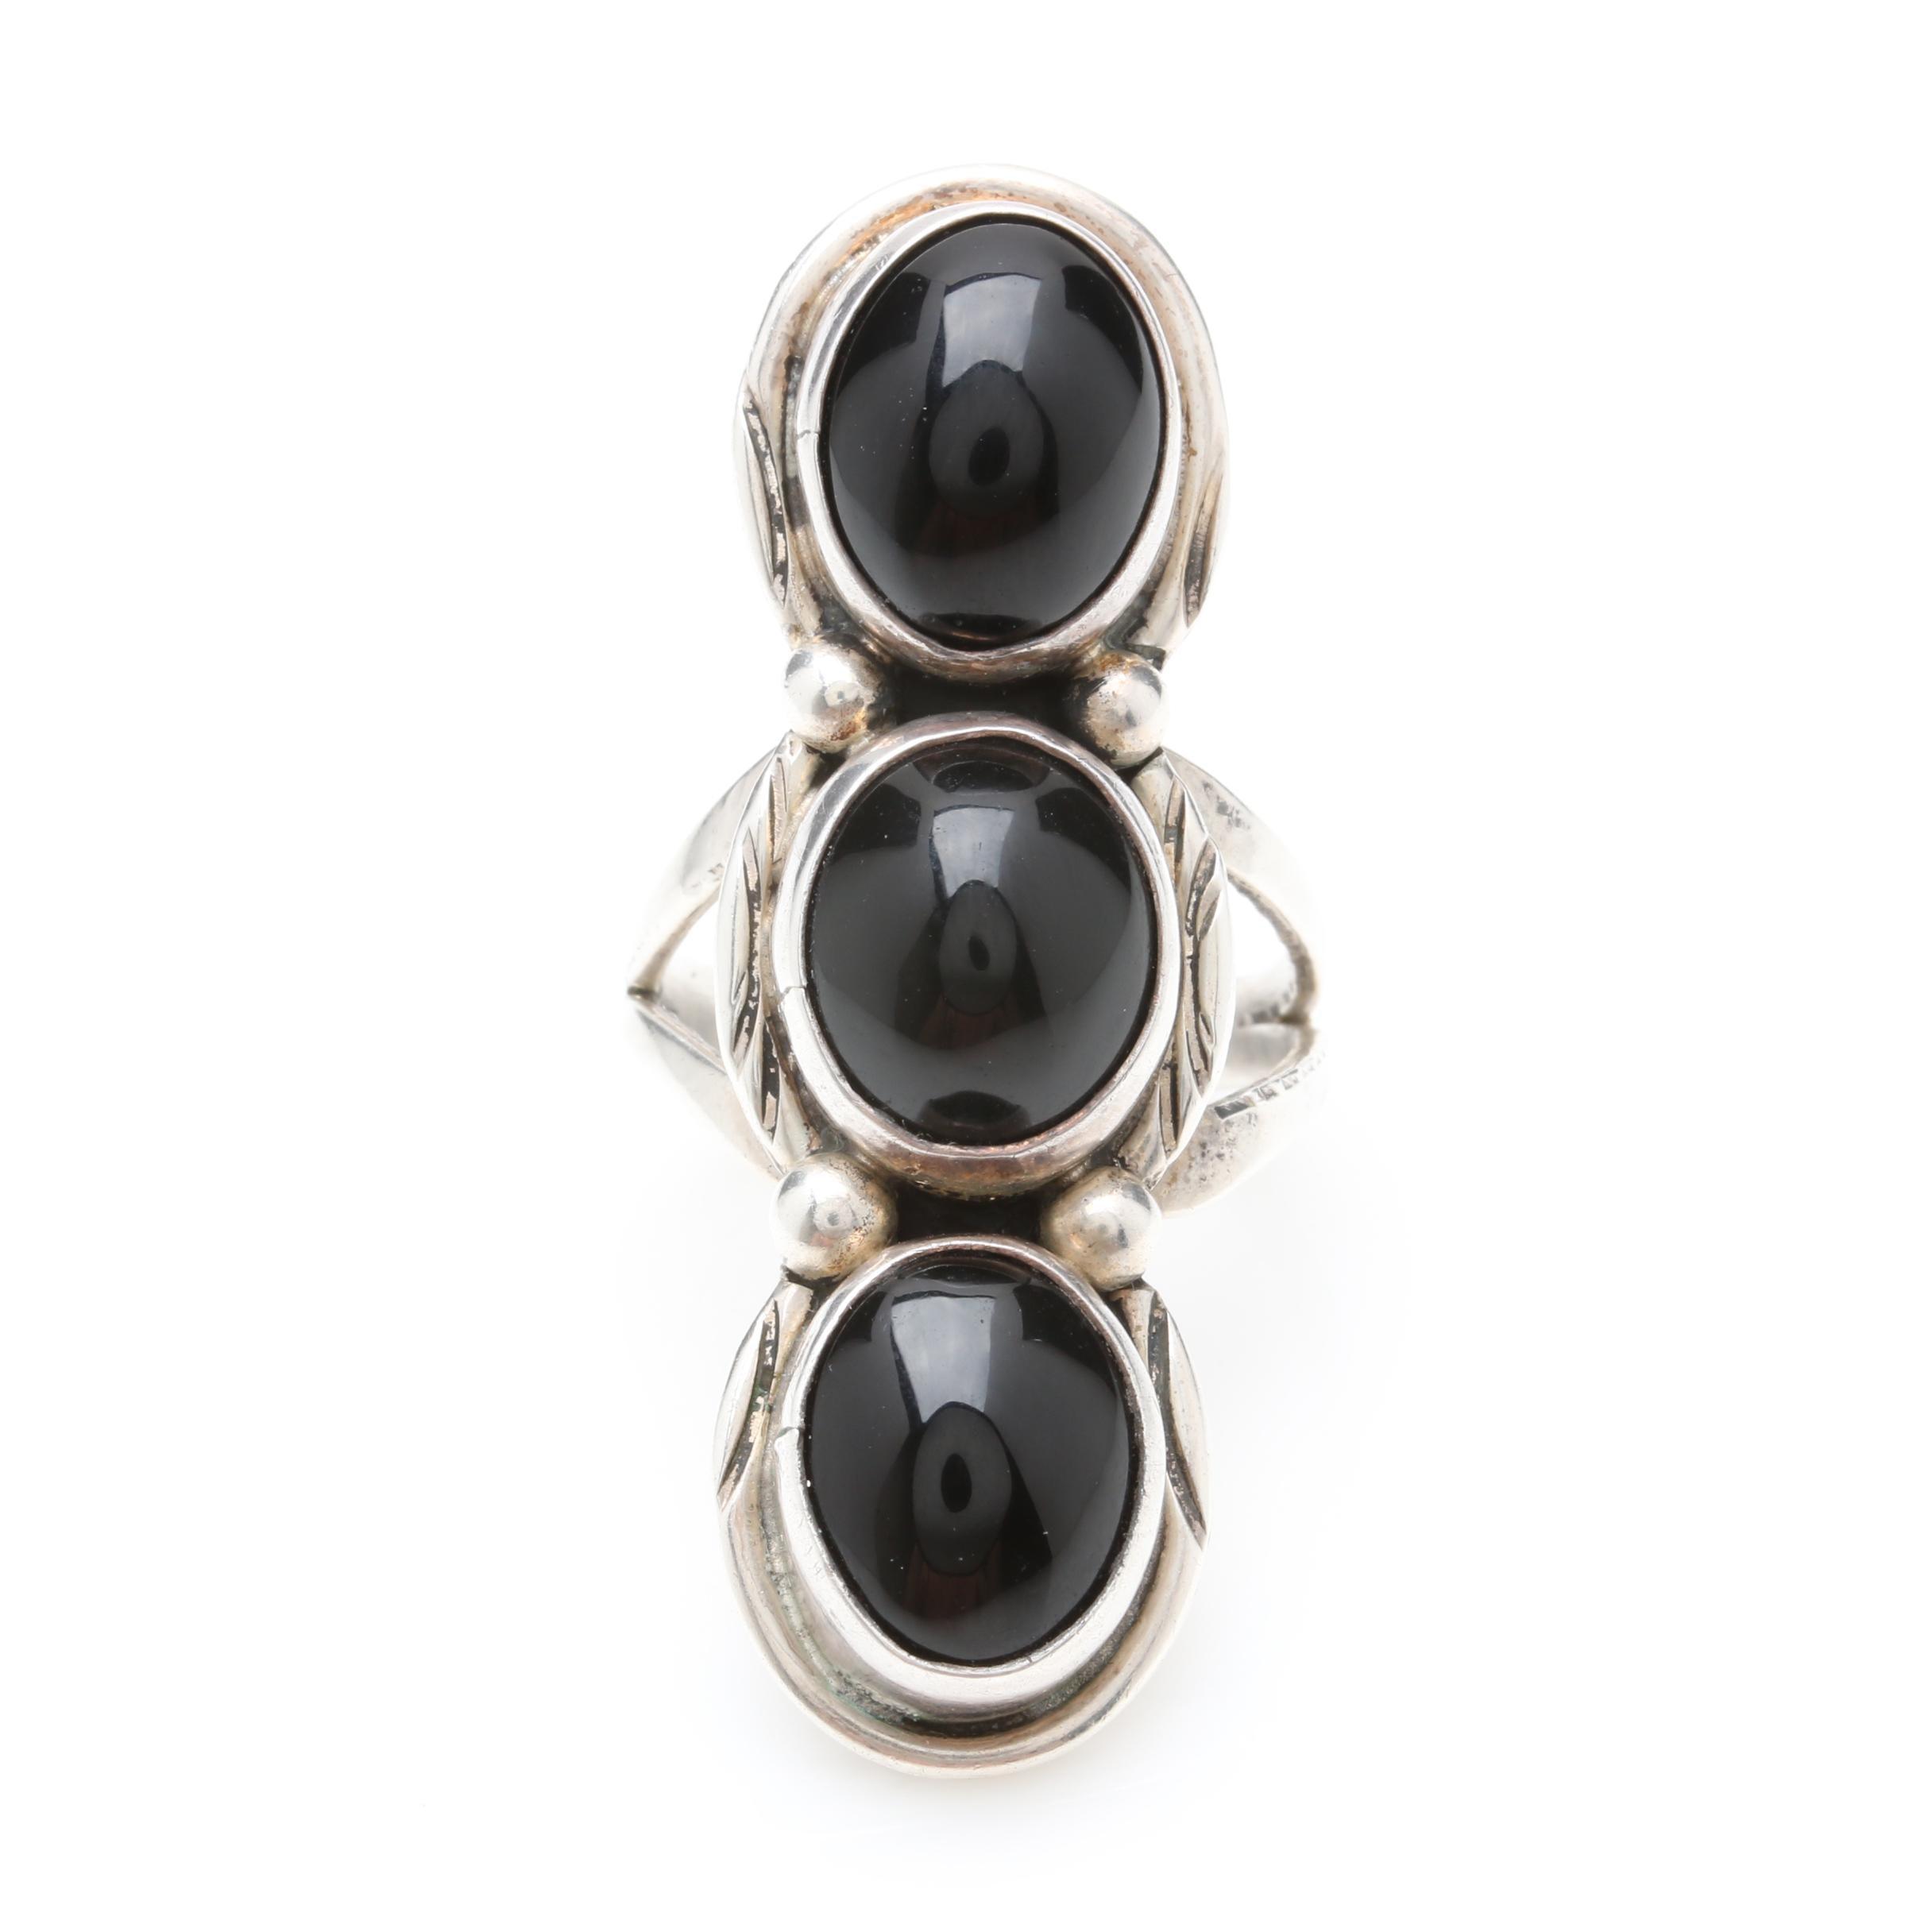 Jack Bly Santo Domingo Pueblo Diné Sterling Silver Onyx Ring